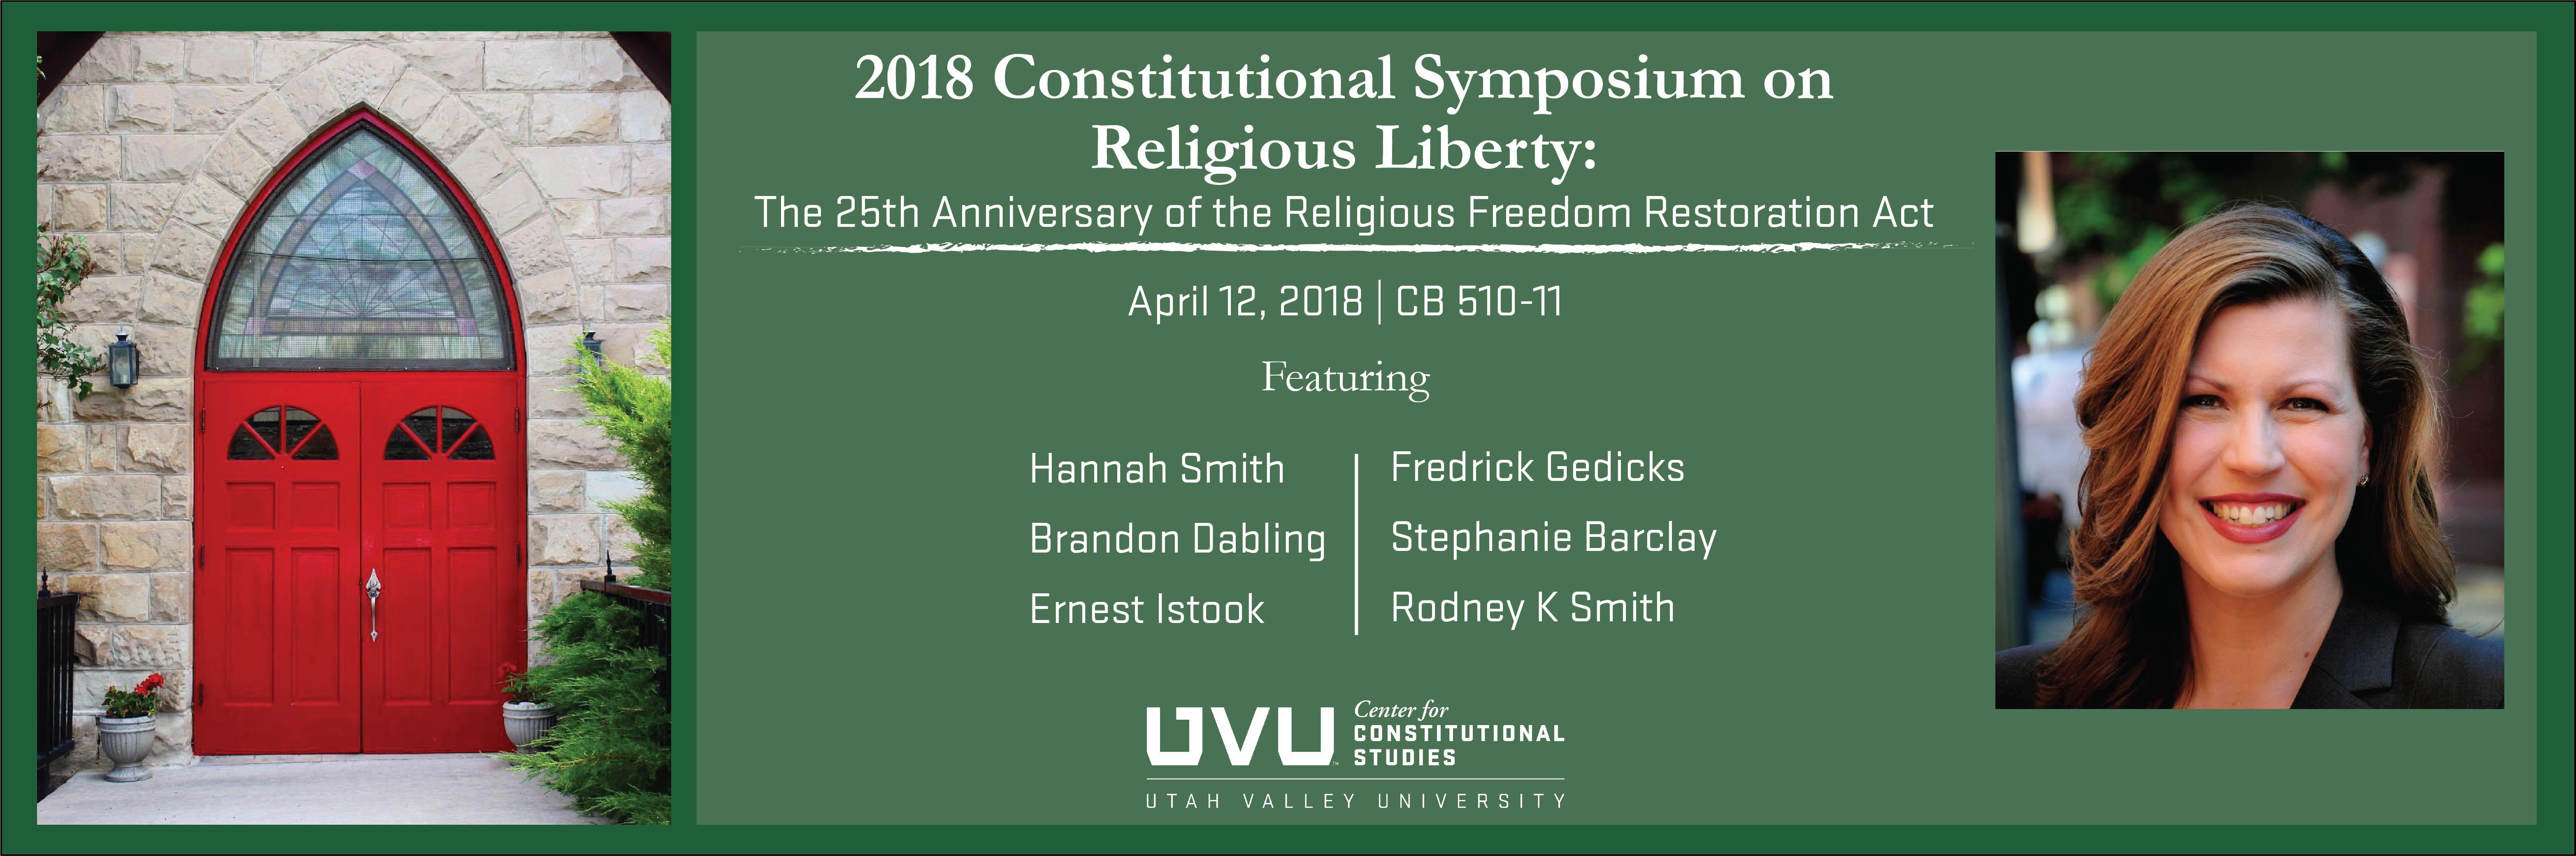 2018 Constitutional Symposium on Religious Liberty